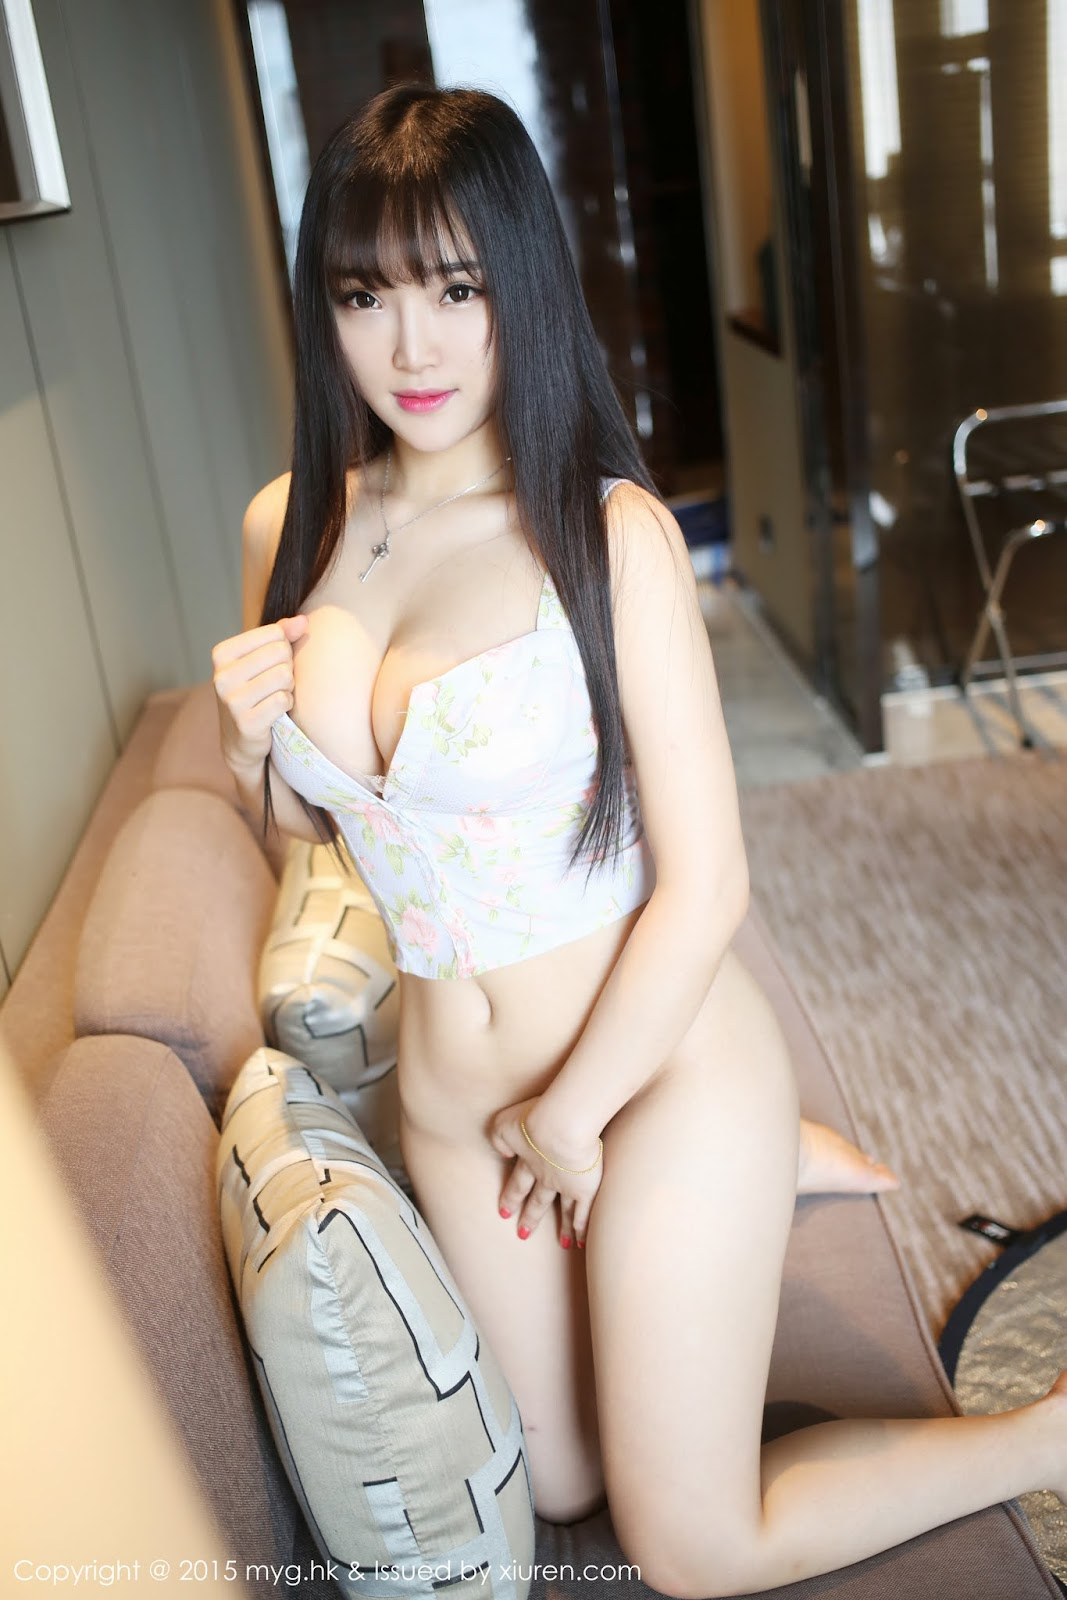 Sexy Girl Model MYGIRL VOL.118